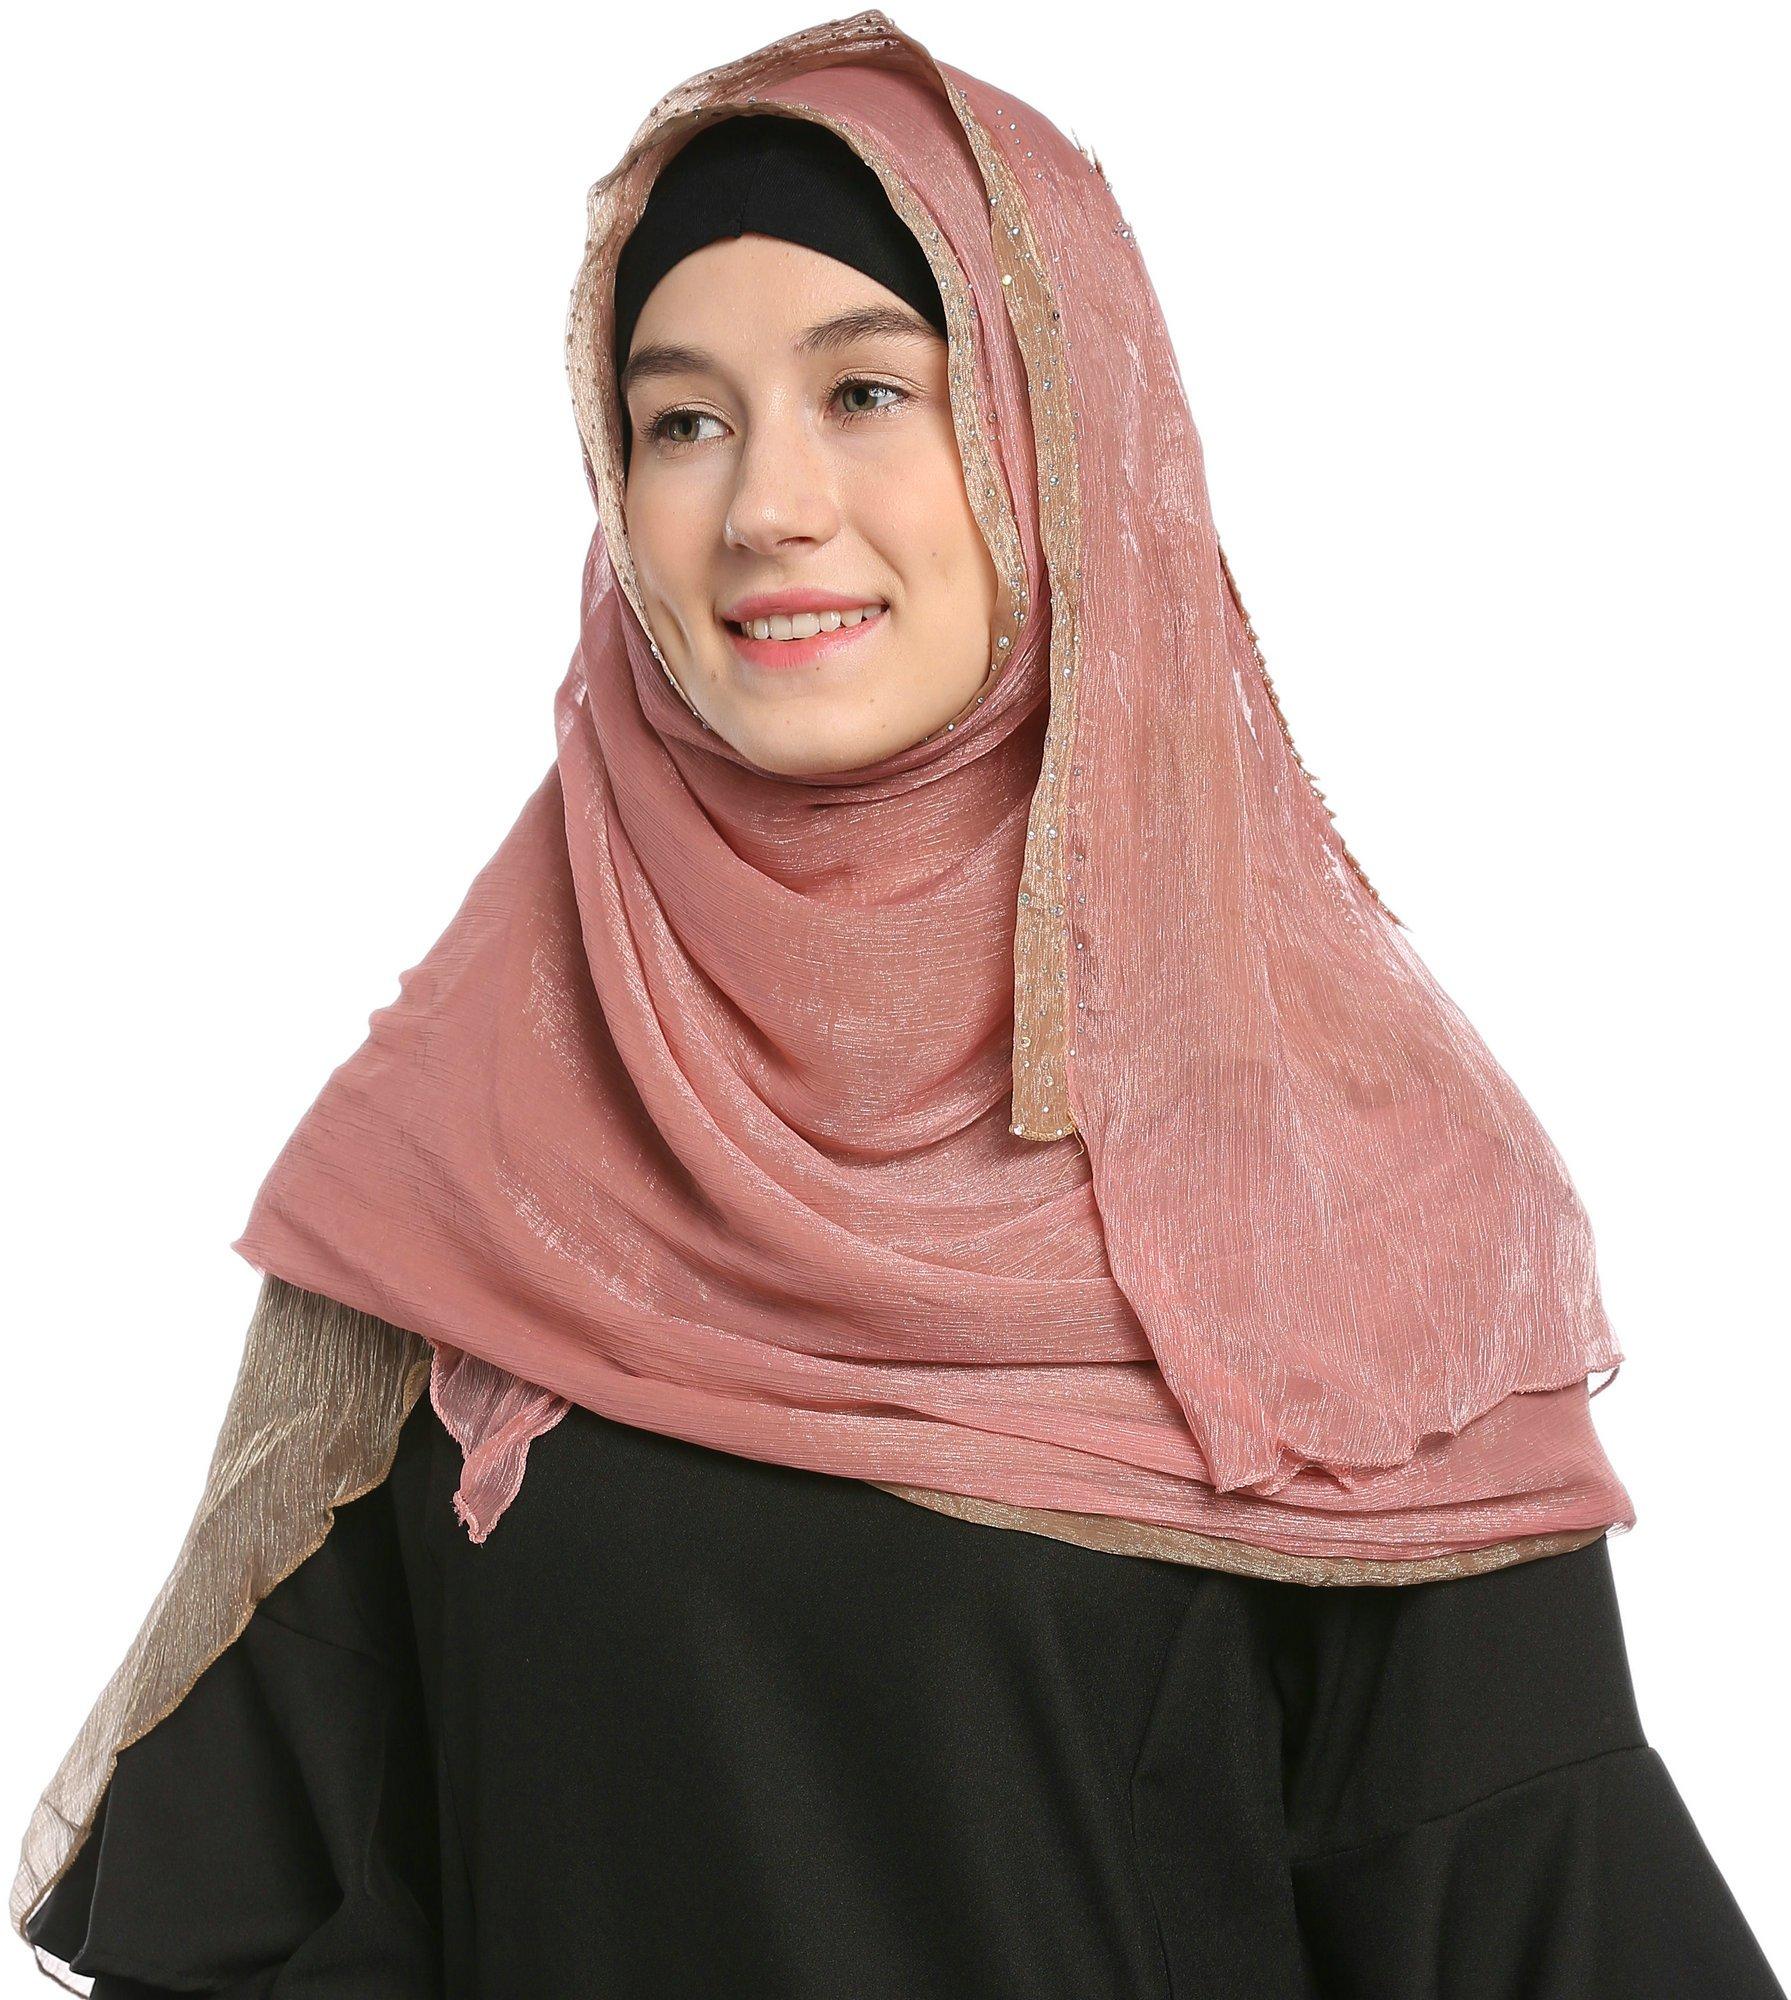 Ababalaya Lace Decorated Wedding Hijab Islamic Hijab,Color3 by Ababalaya (Image #7)